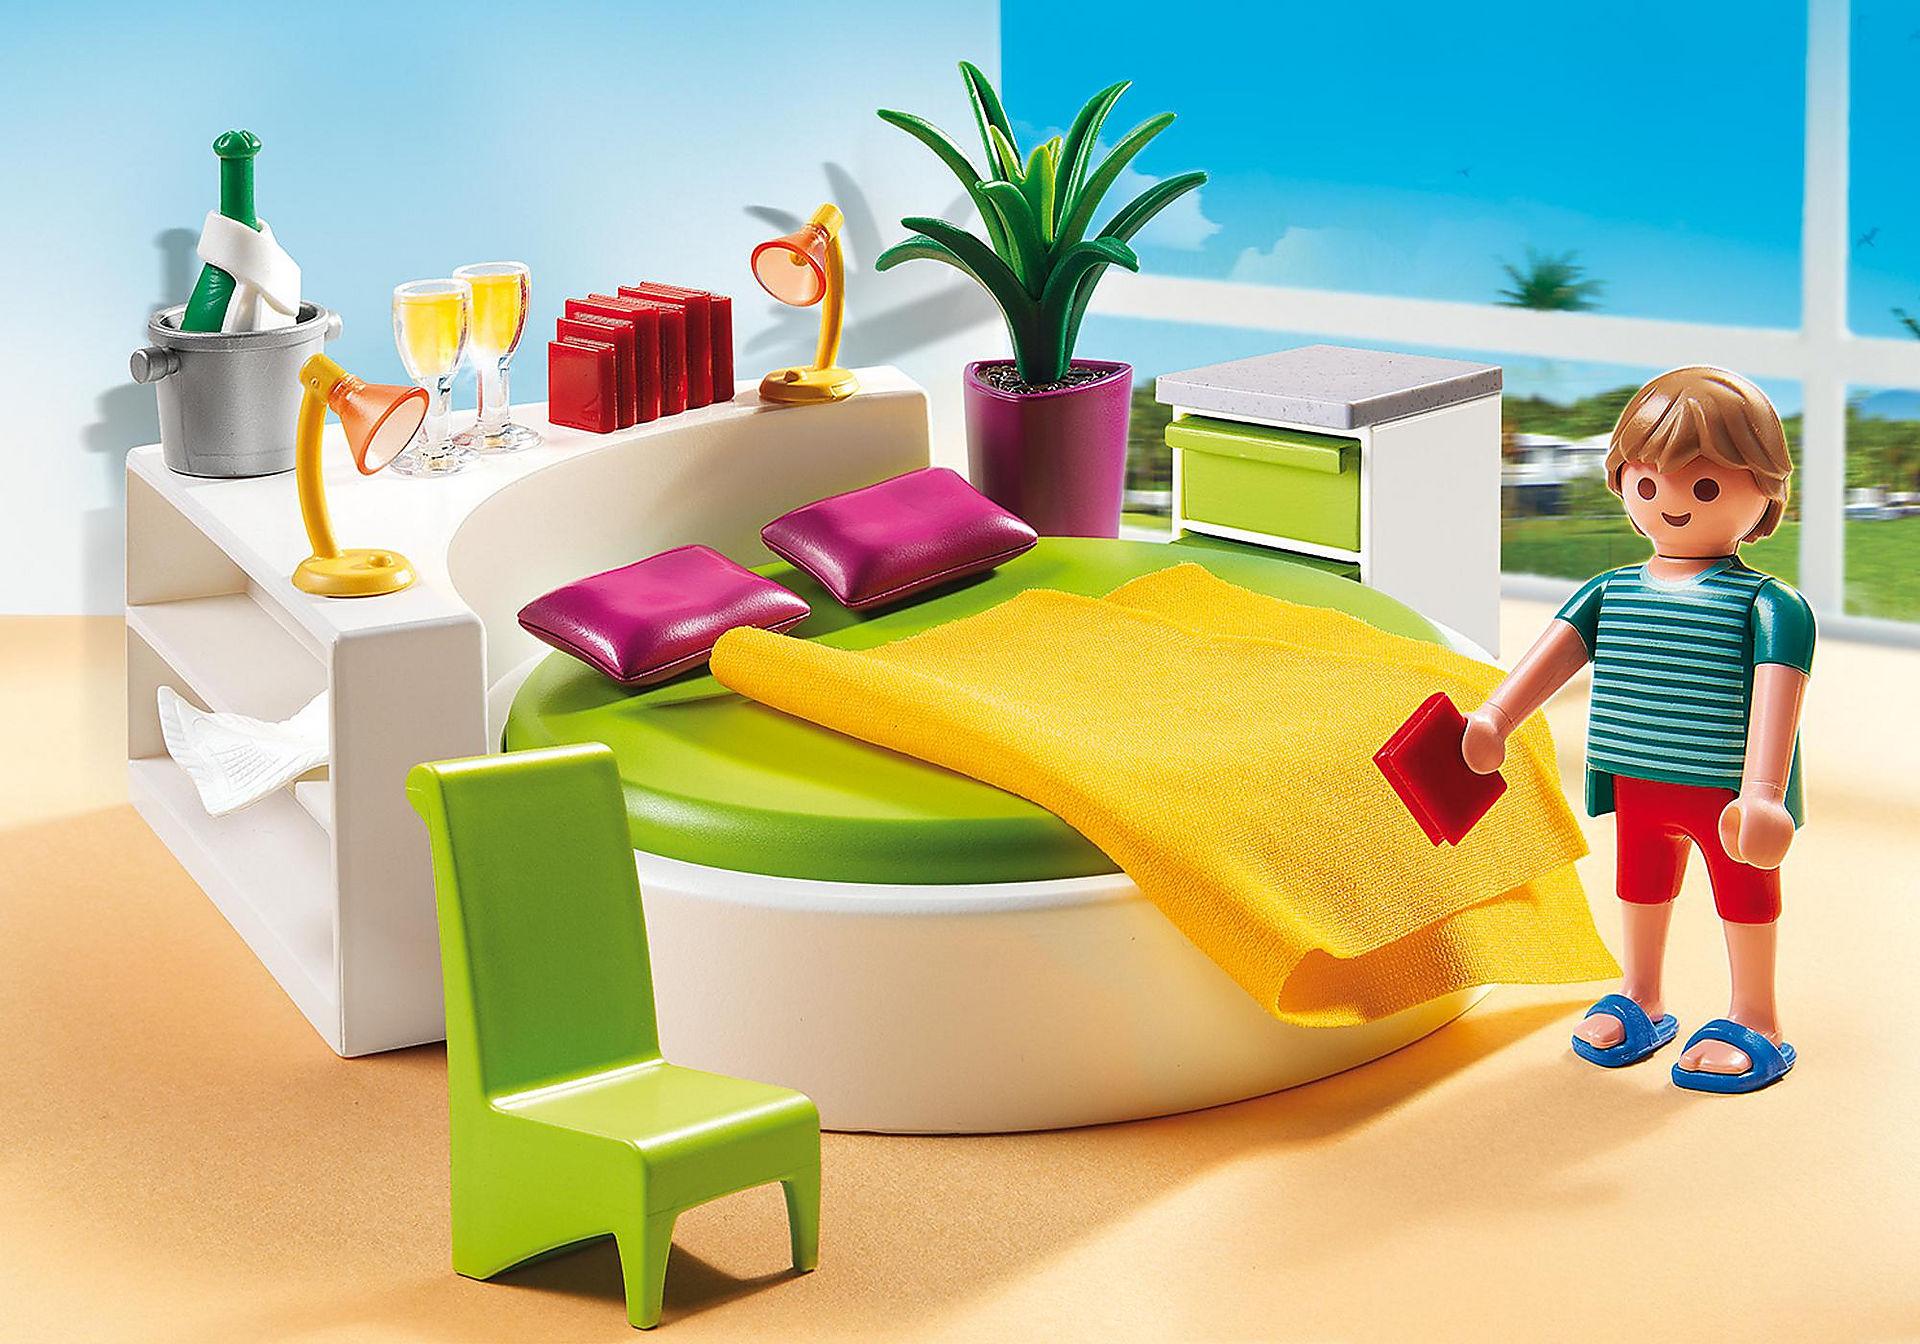 http://media.playmobil.com/i/playmobil/5583_product_detail/Slaapkamer met loungebed